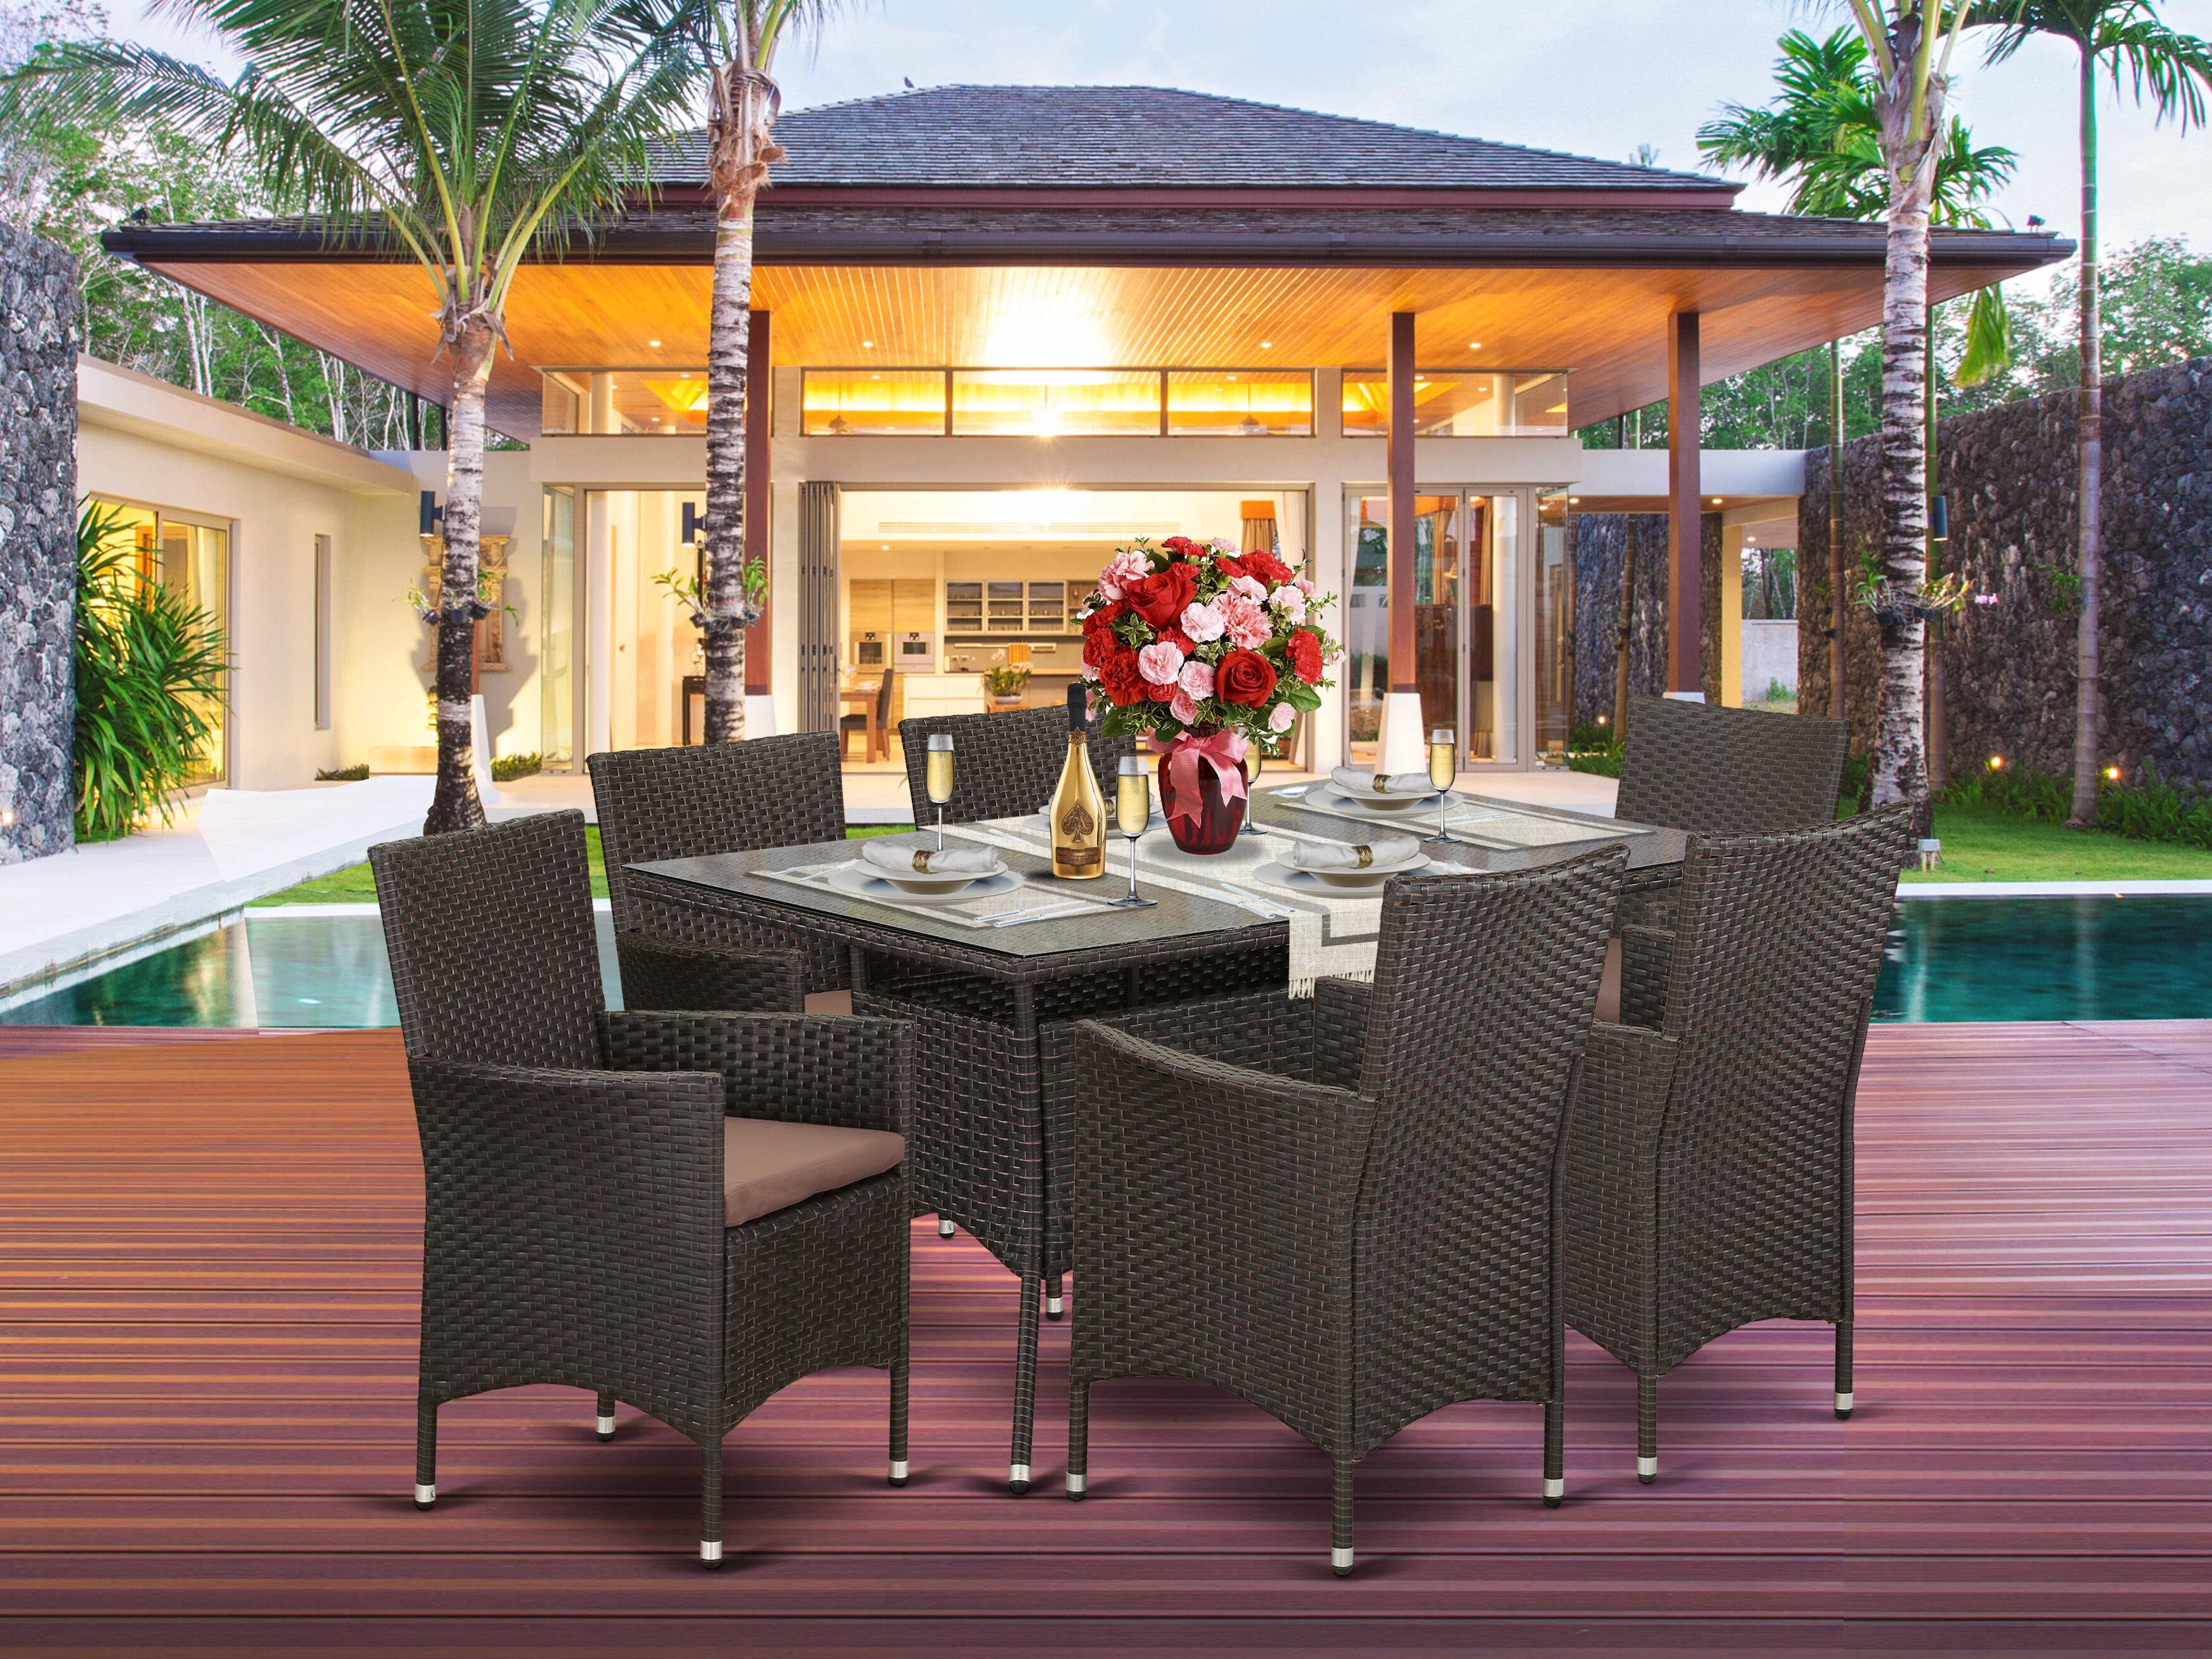 Pleasing Axl Backyard 7 Piece Dining Set With Cushions Lamtechconsult Wood Chair Design Ideas Lamtechconsultcom